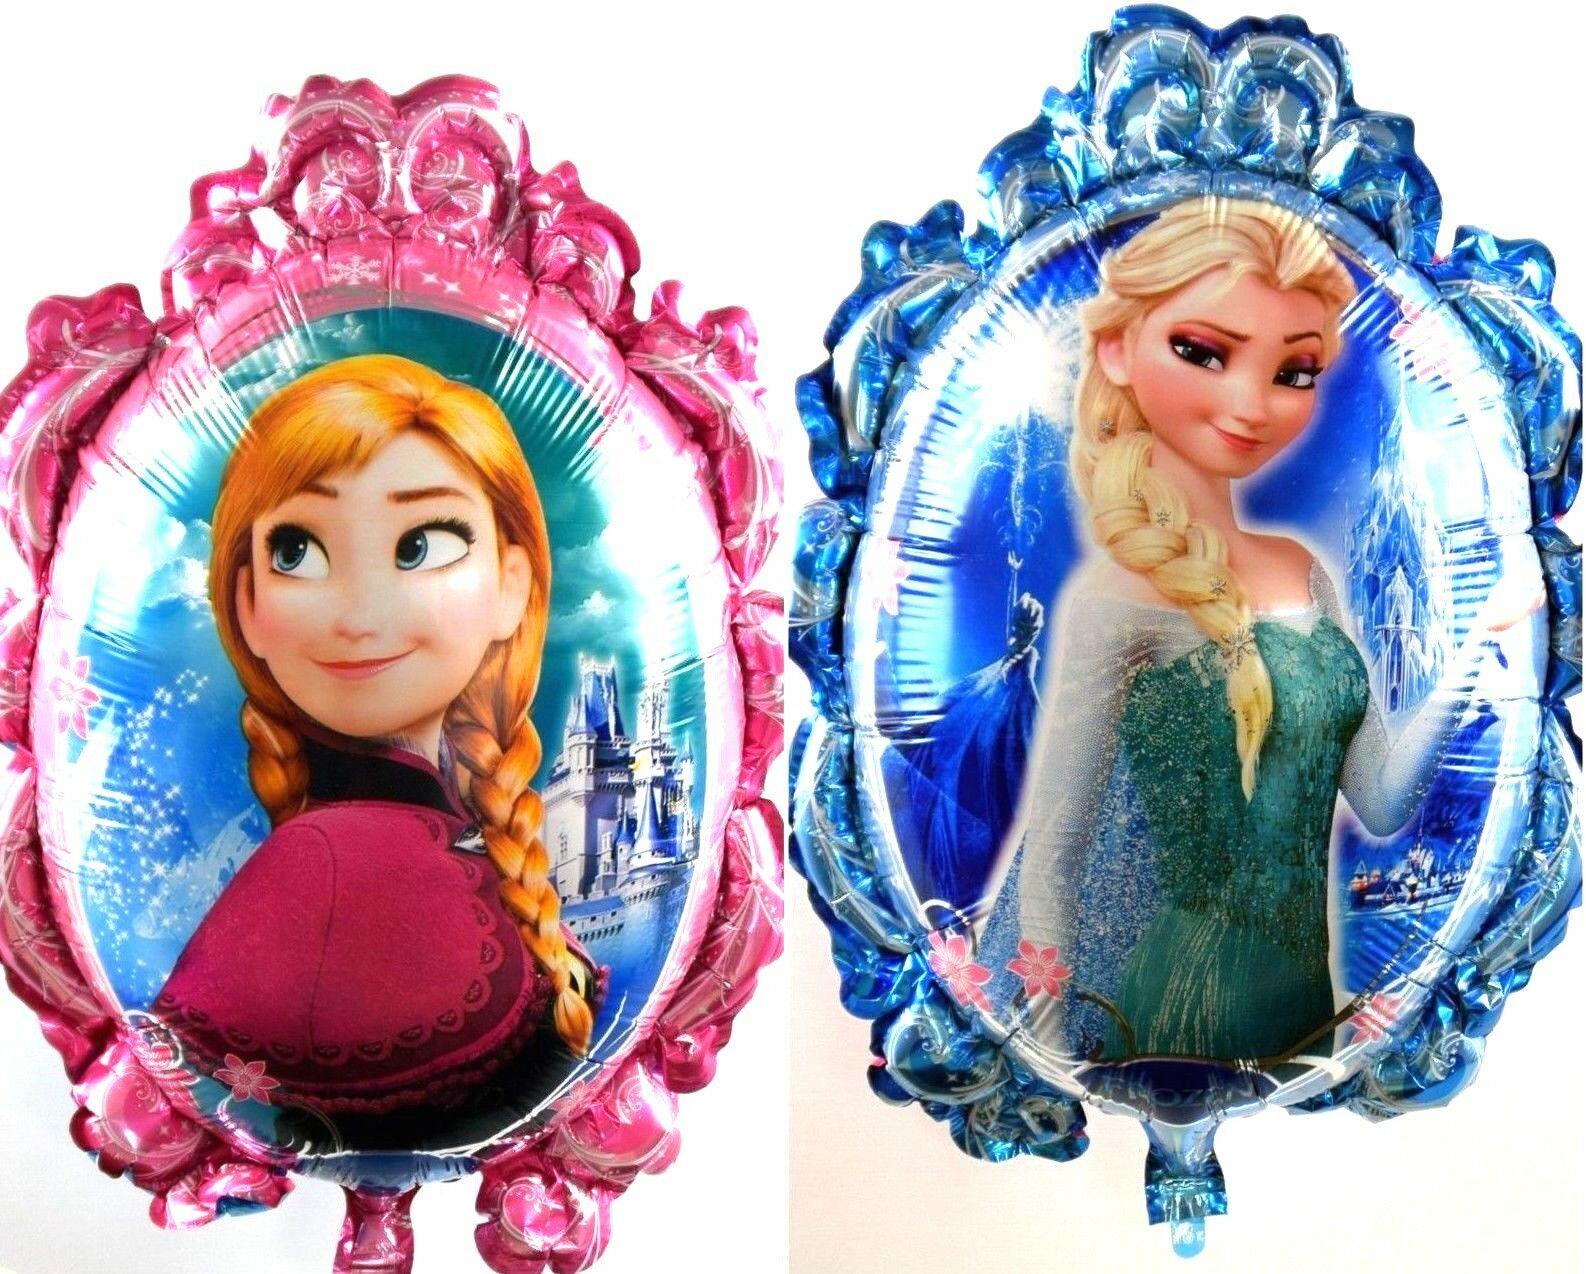 R1f6 Folienballon Helium Luftballon Elsa Anna Olaf Frozen